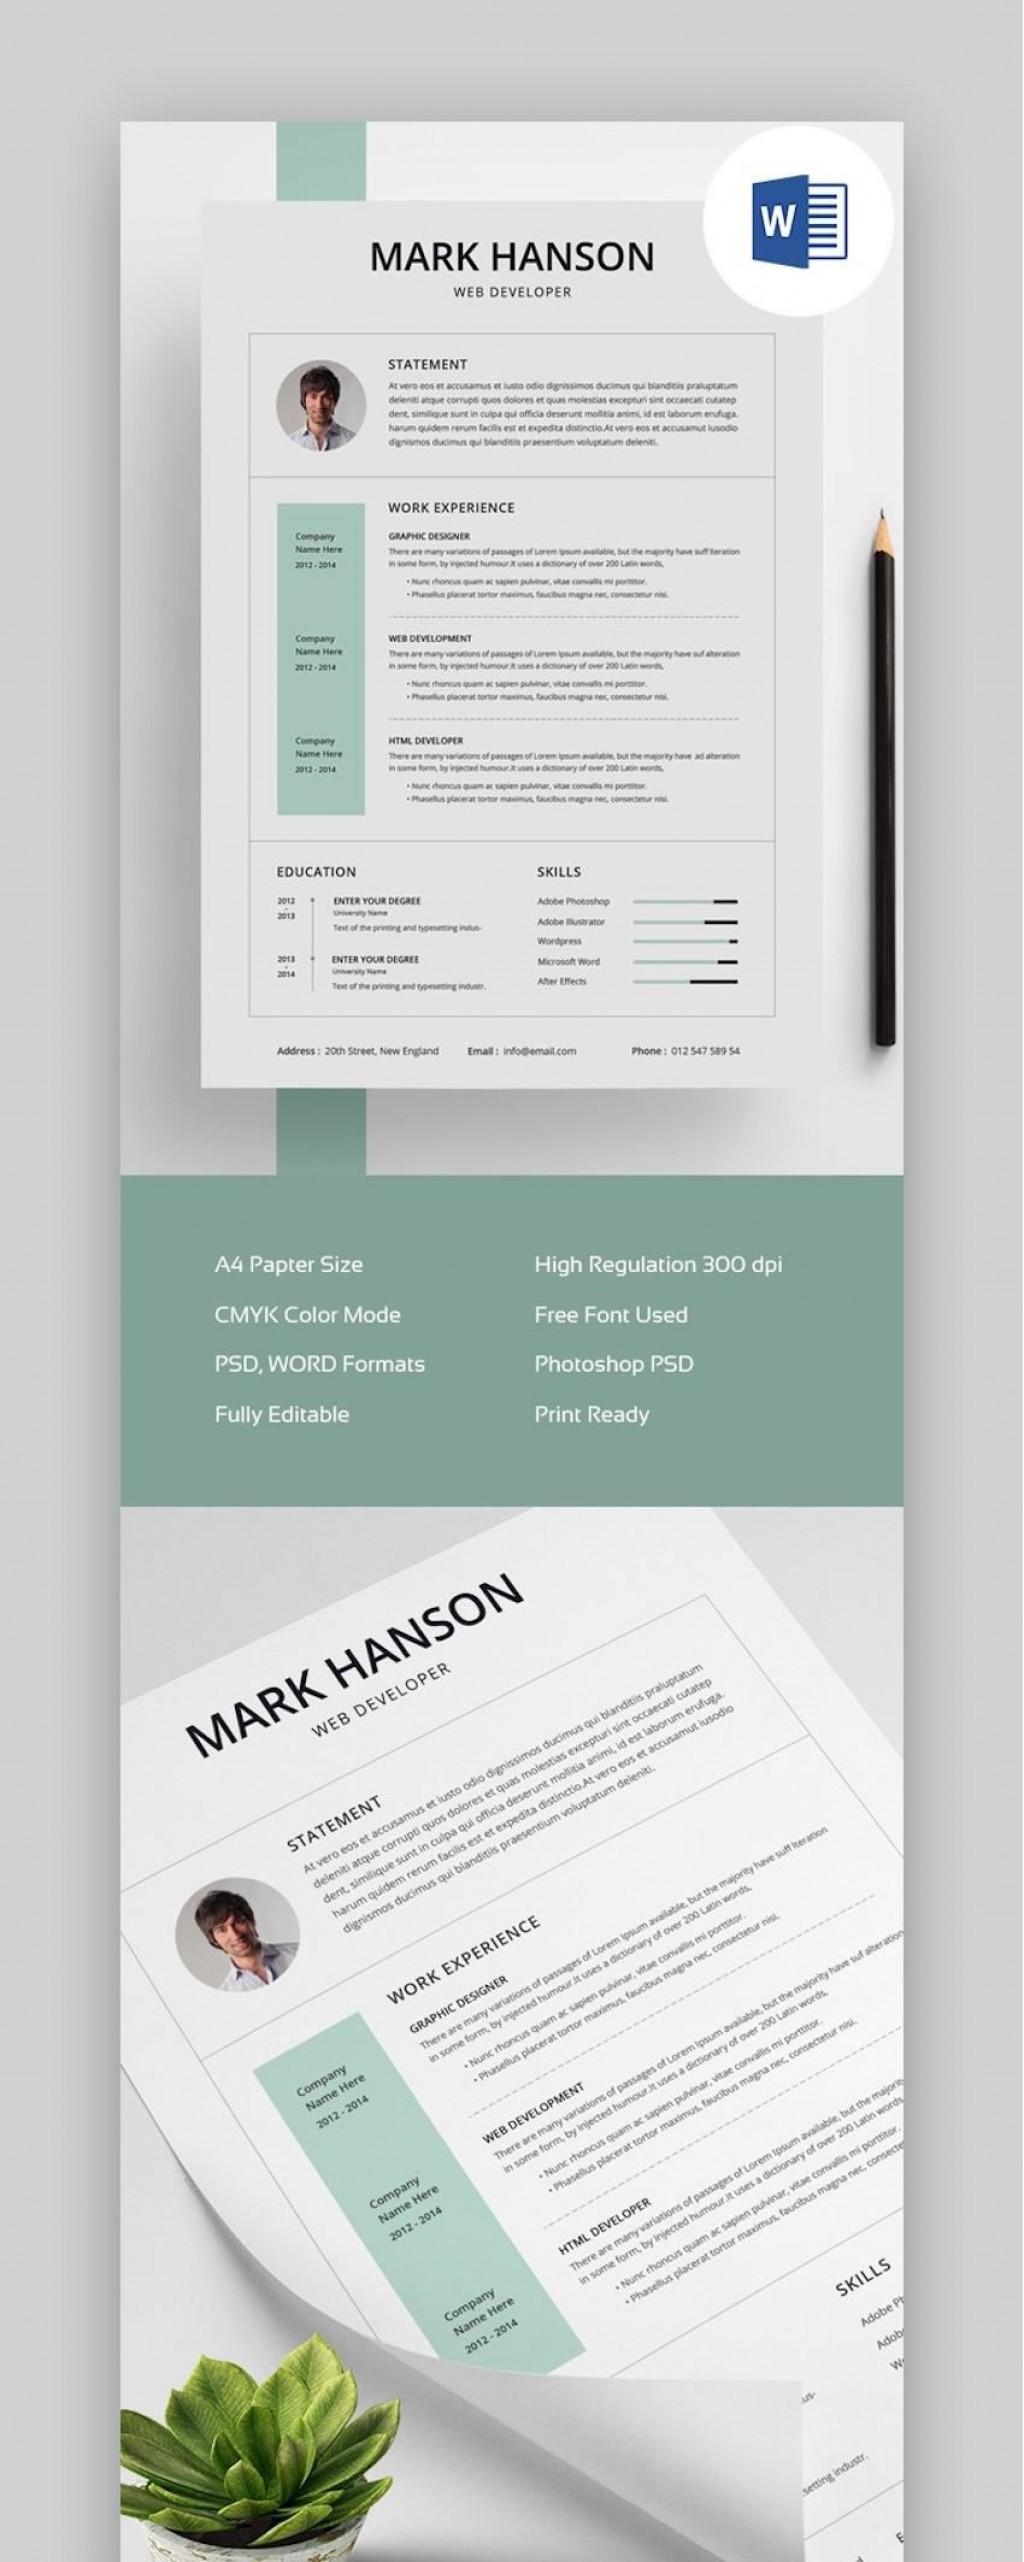 003 Singular Psd Resume Template Free Download Concept  Graphic Designer Creative CvLarge